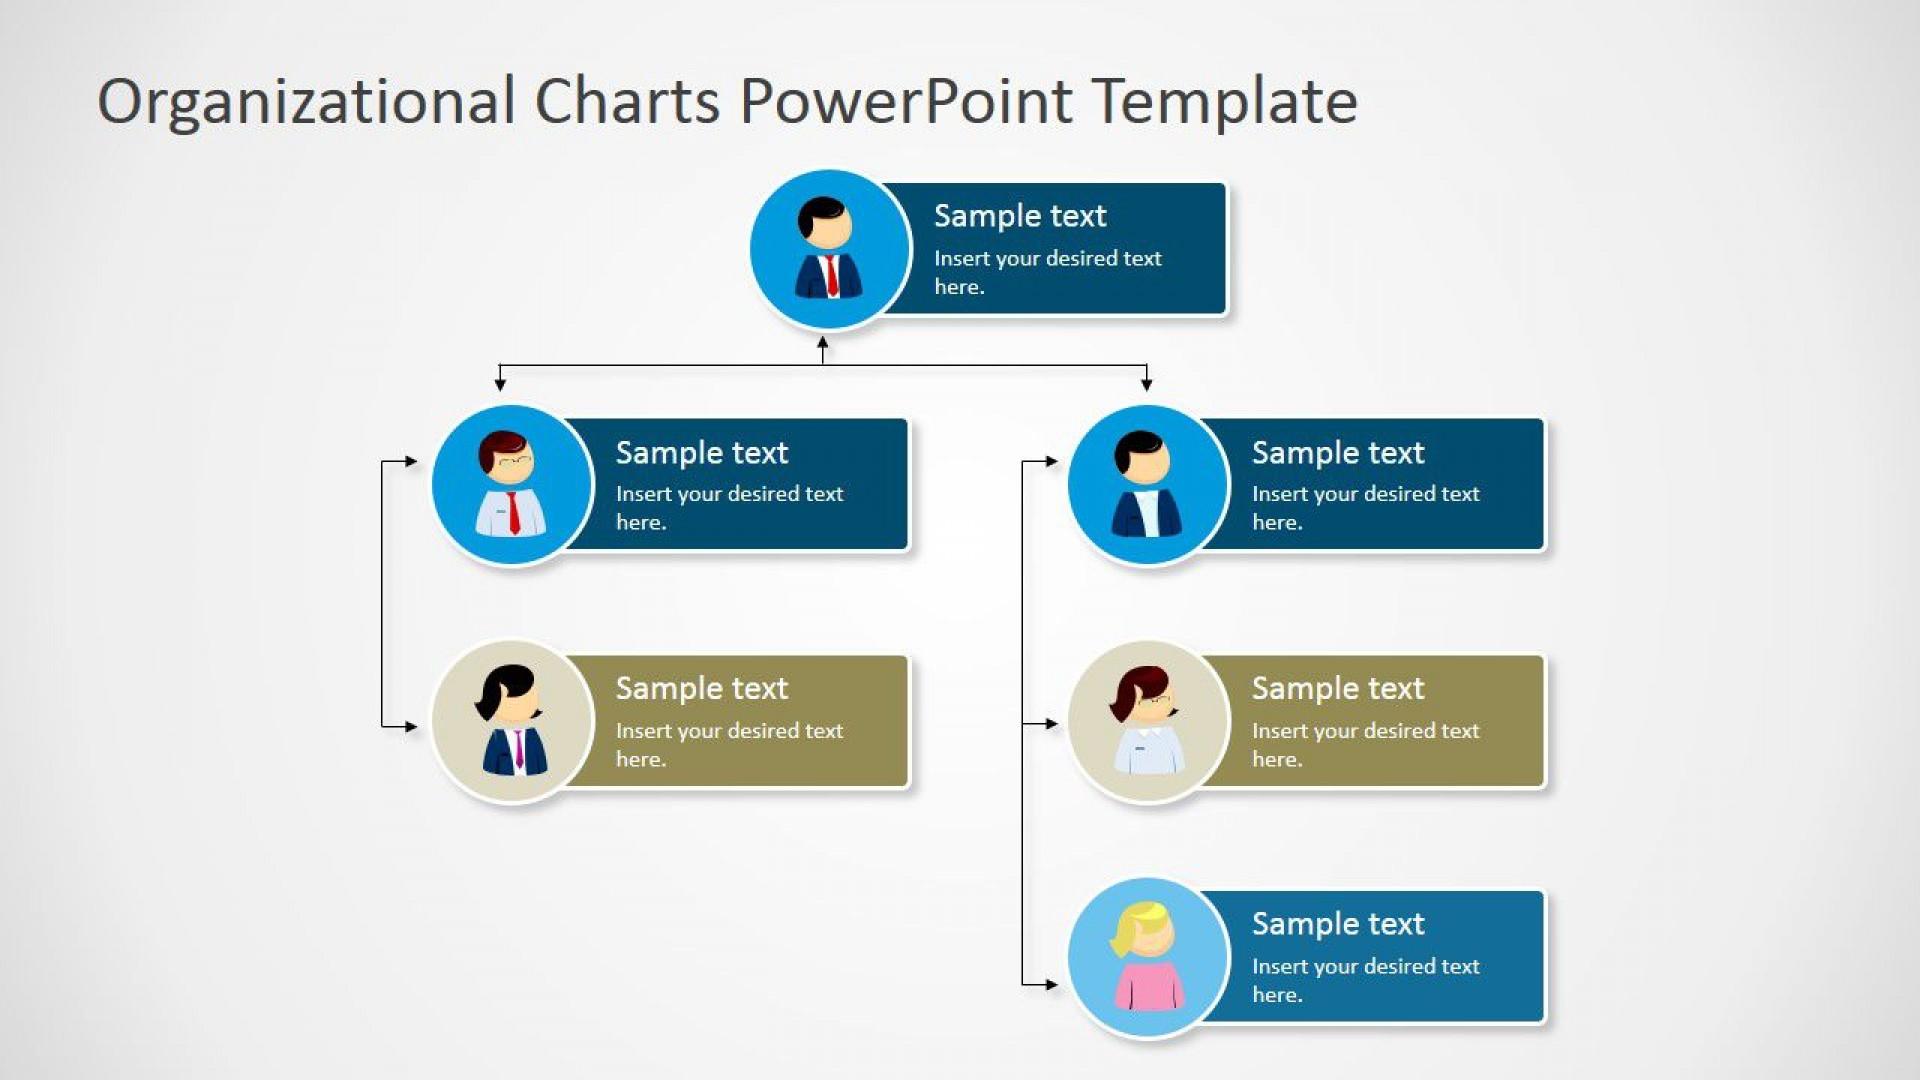 002 Outstanding Org Chart Template Powerpoint High Resolution  Free Organization Download Organizational 20101920